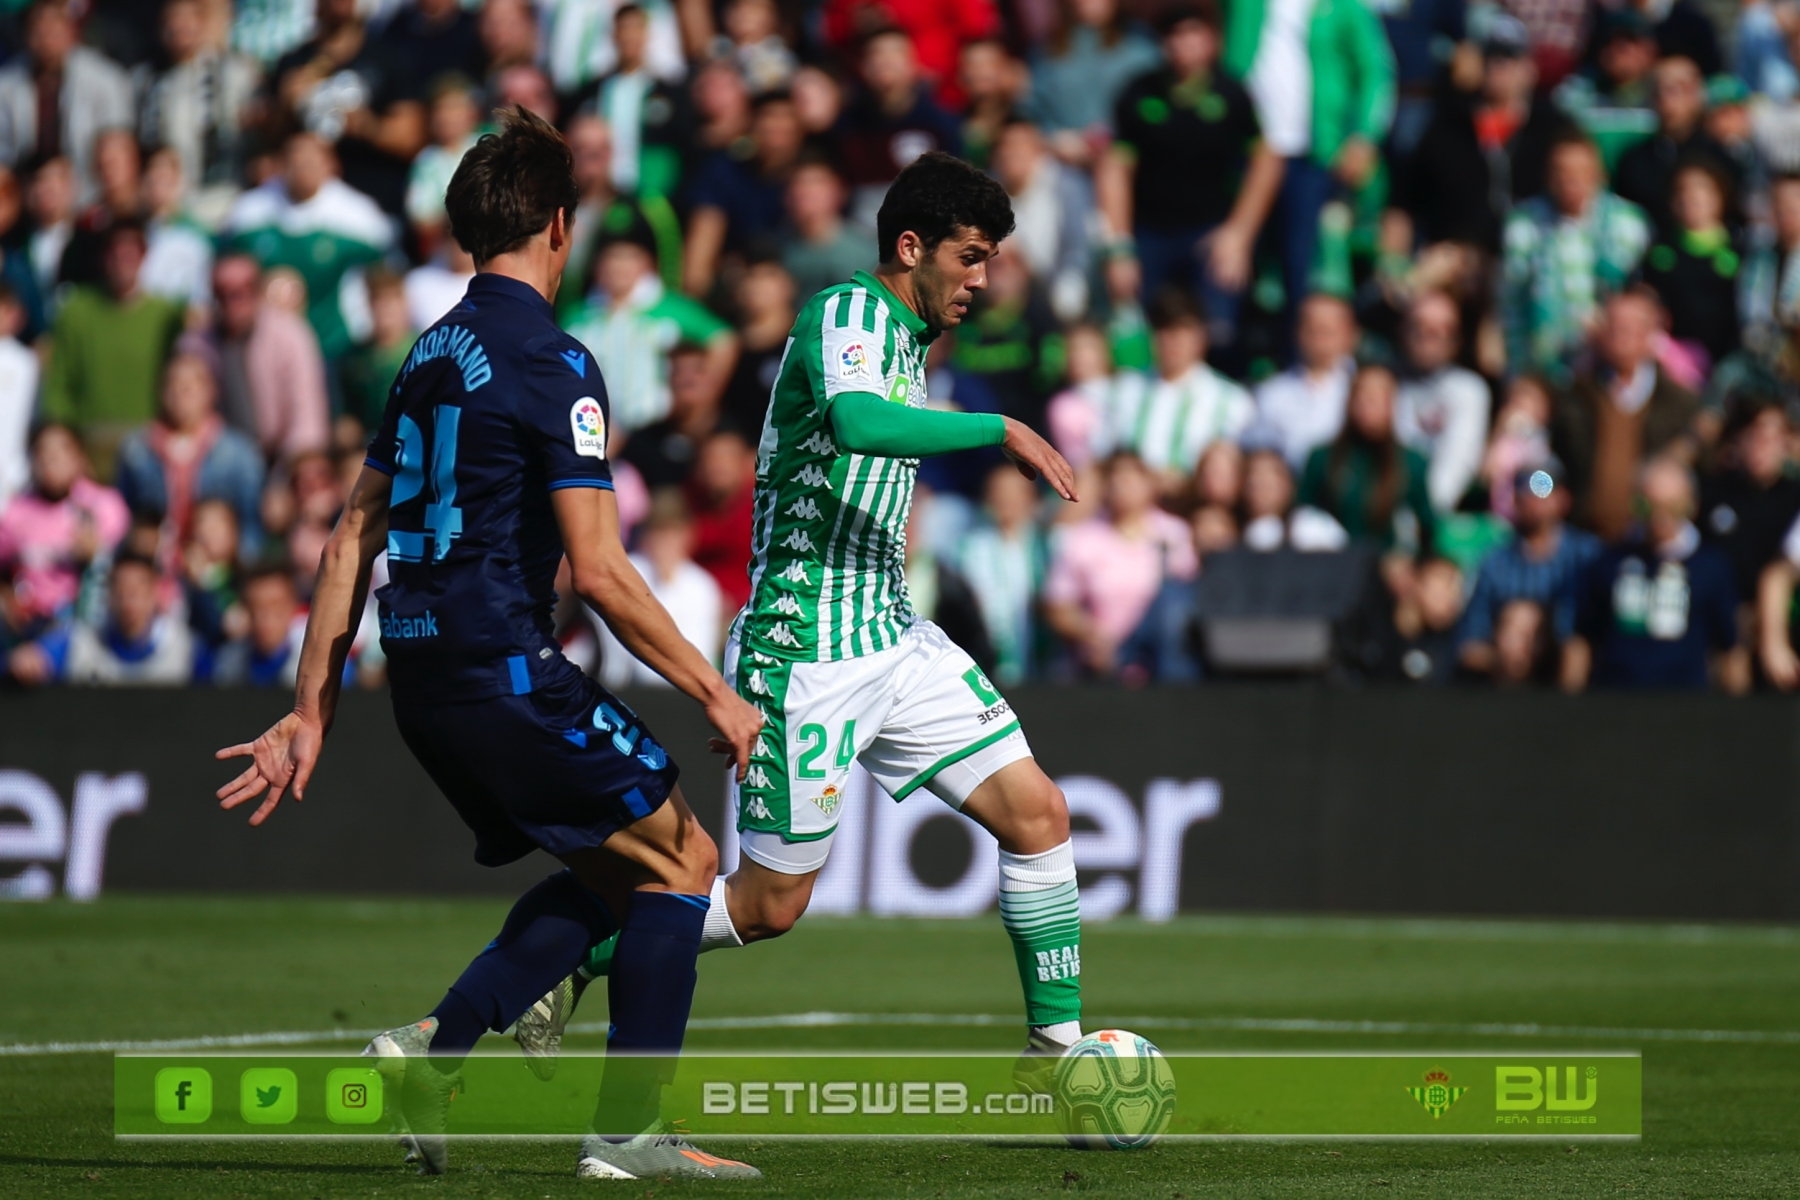 J20 Real Betis - Real Sociedad 13